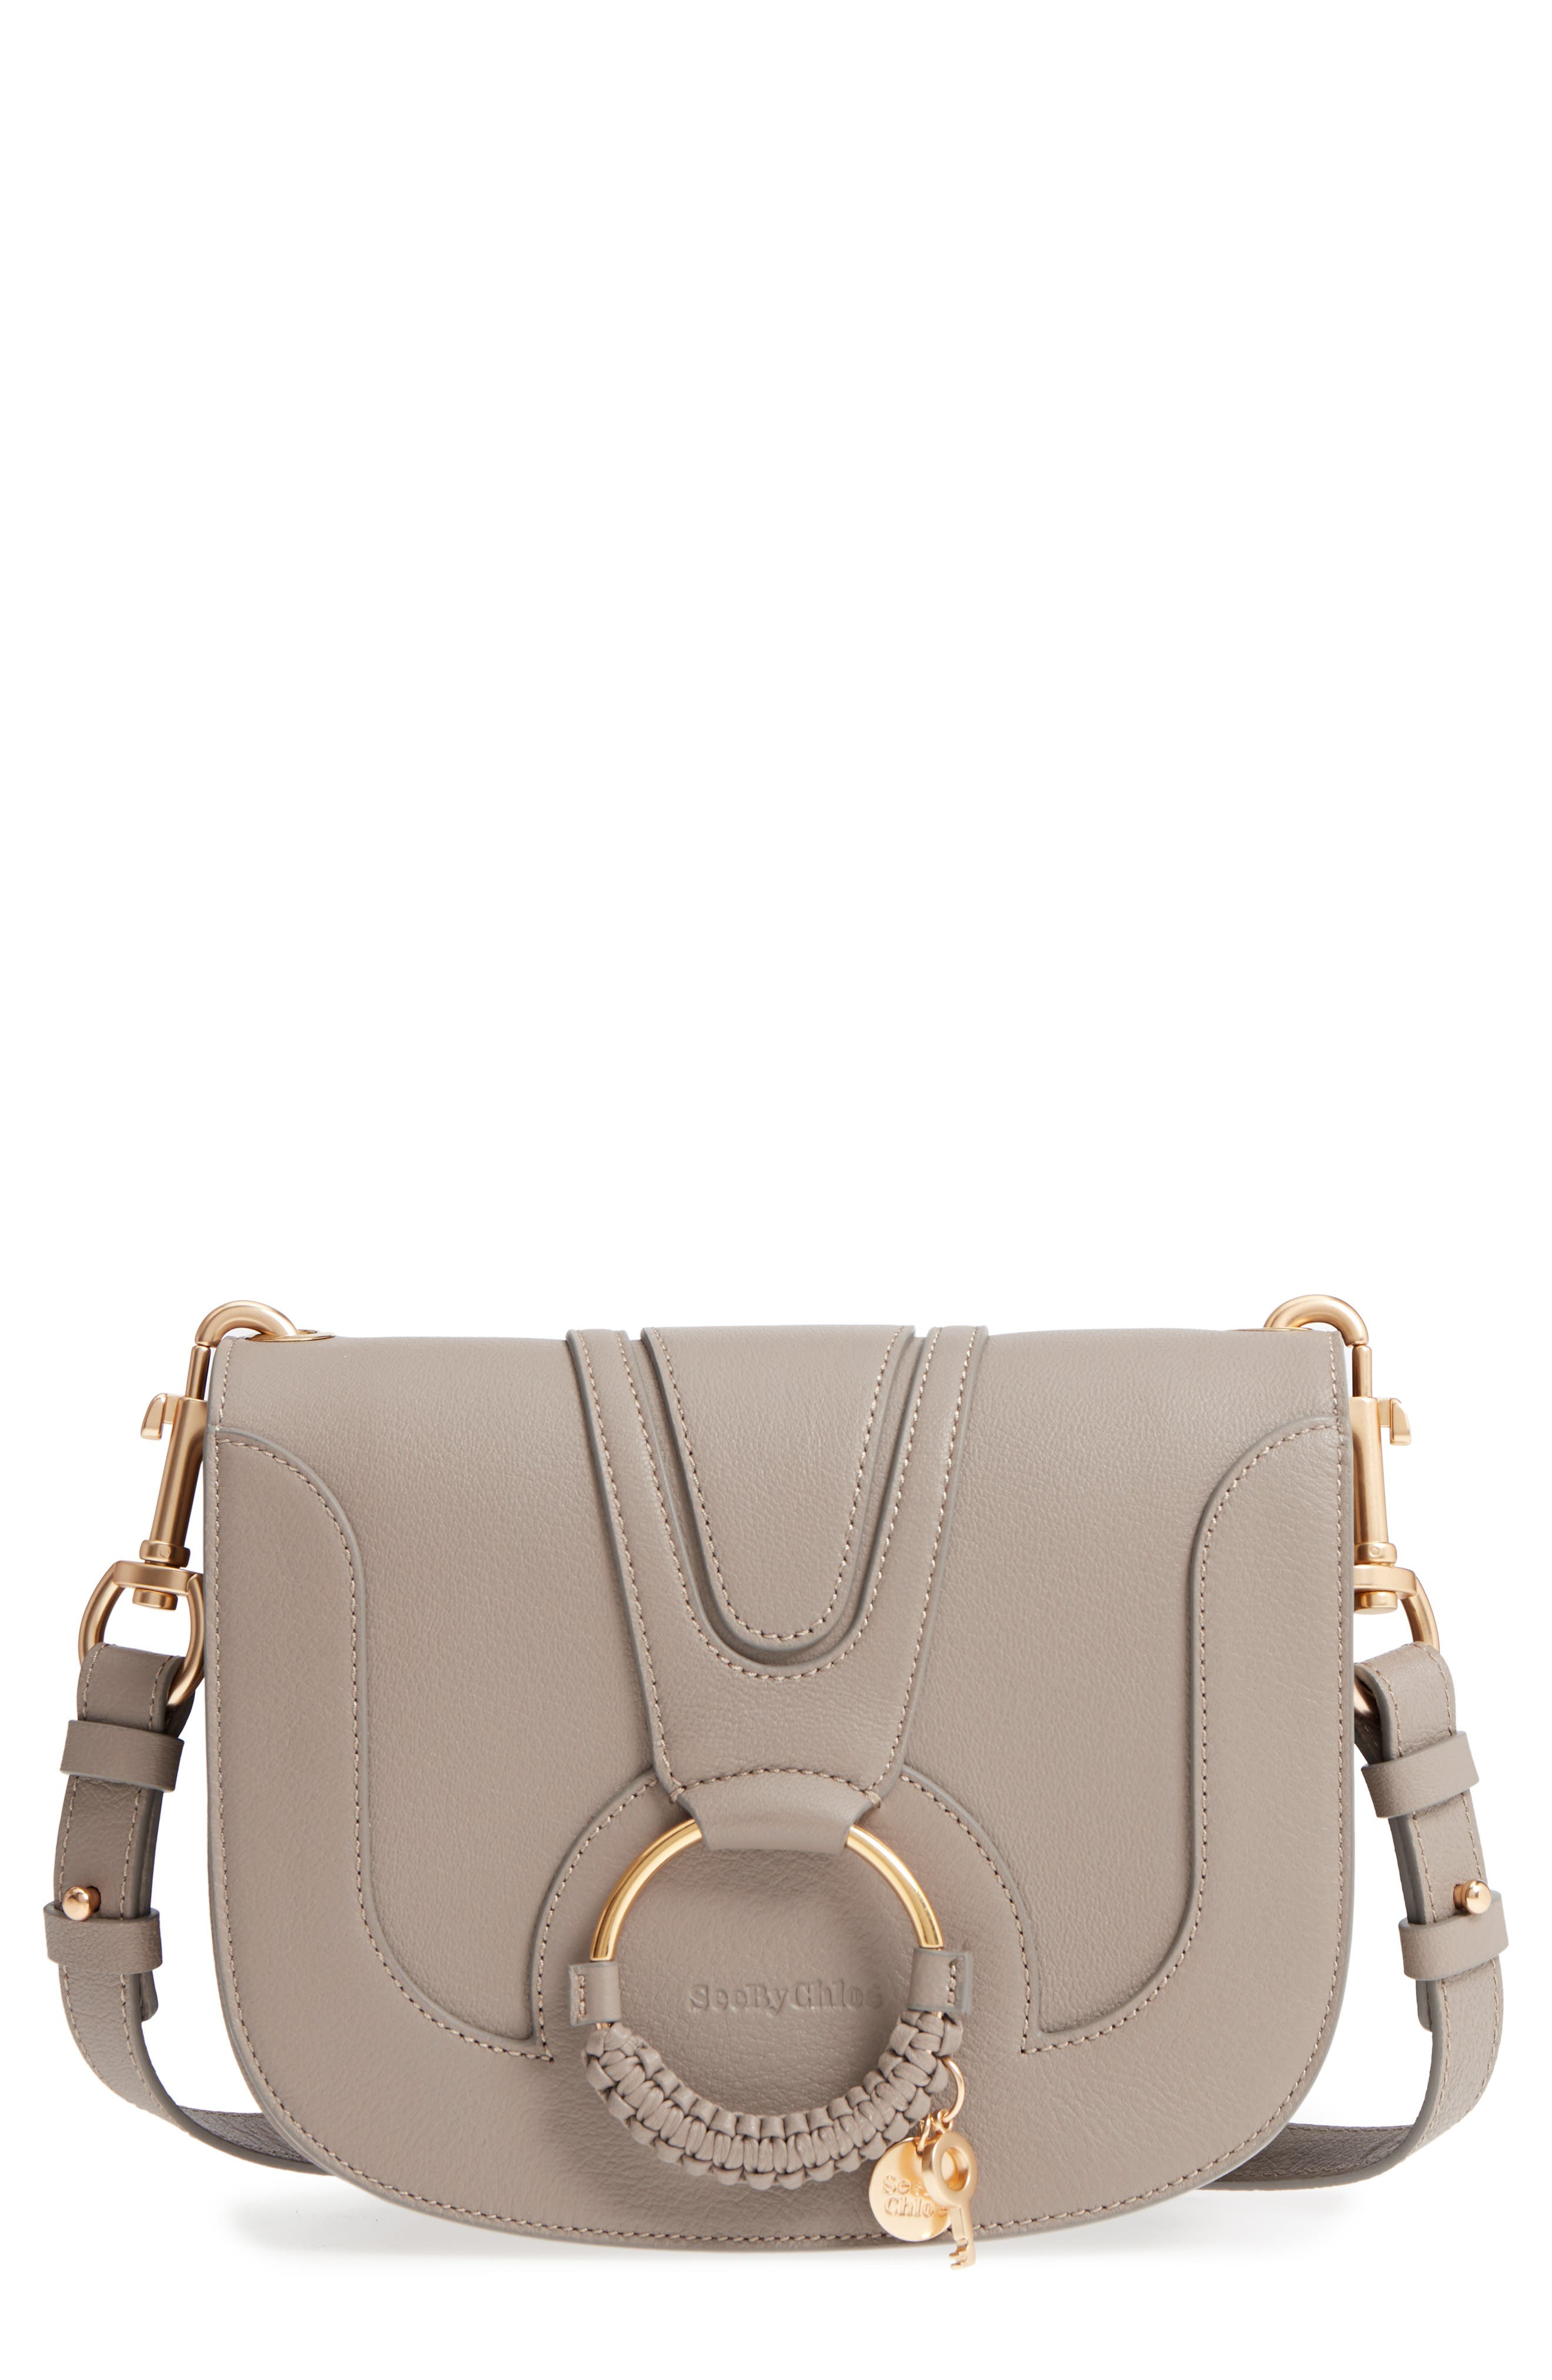 Hana Small Leather Crossbody Bag,                             Main thumbnail 2, color,